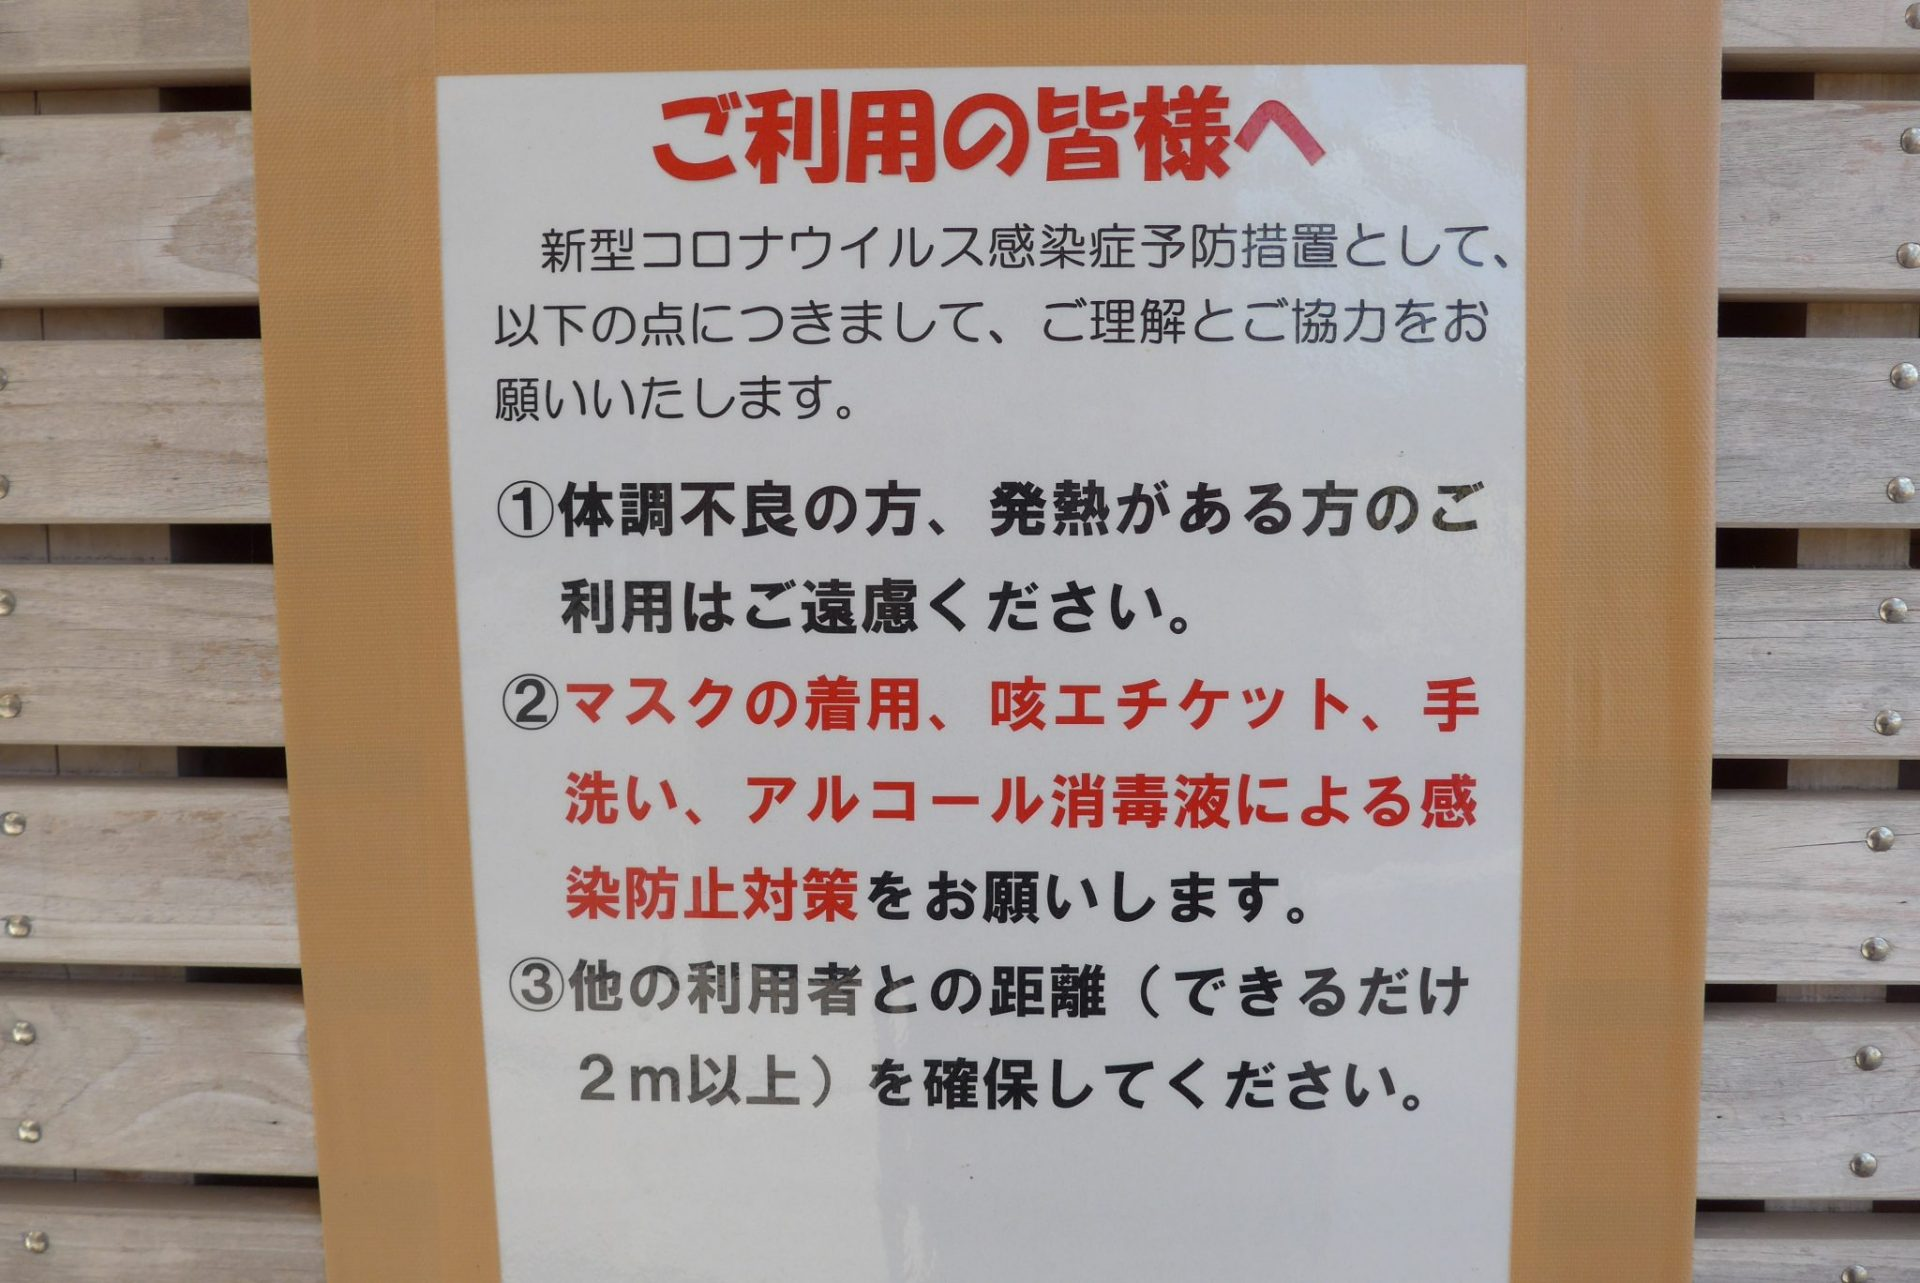 (K)阿川ほうせんぐり海浜公園の無料駐車場が便利!車中泊いいかも